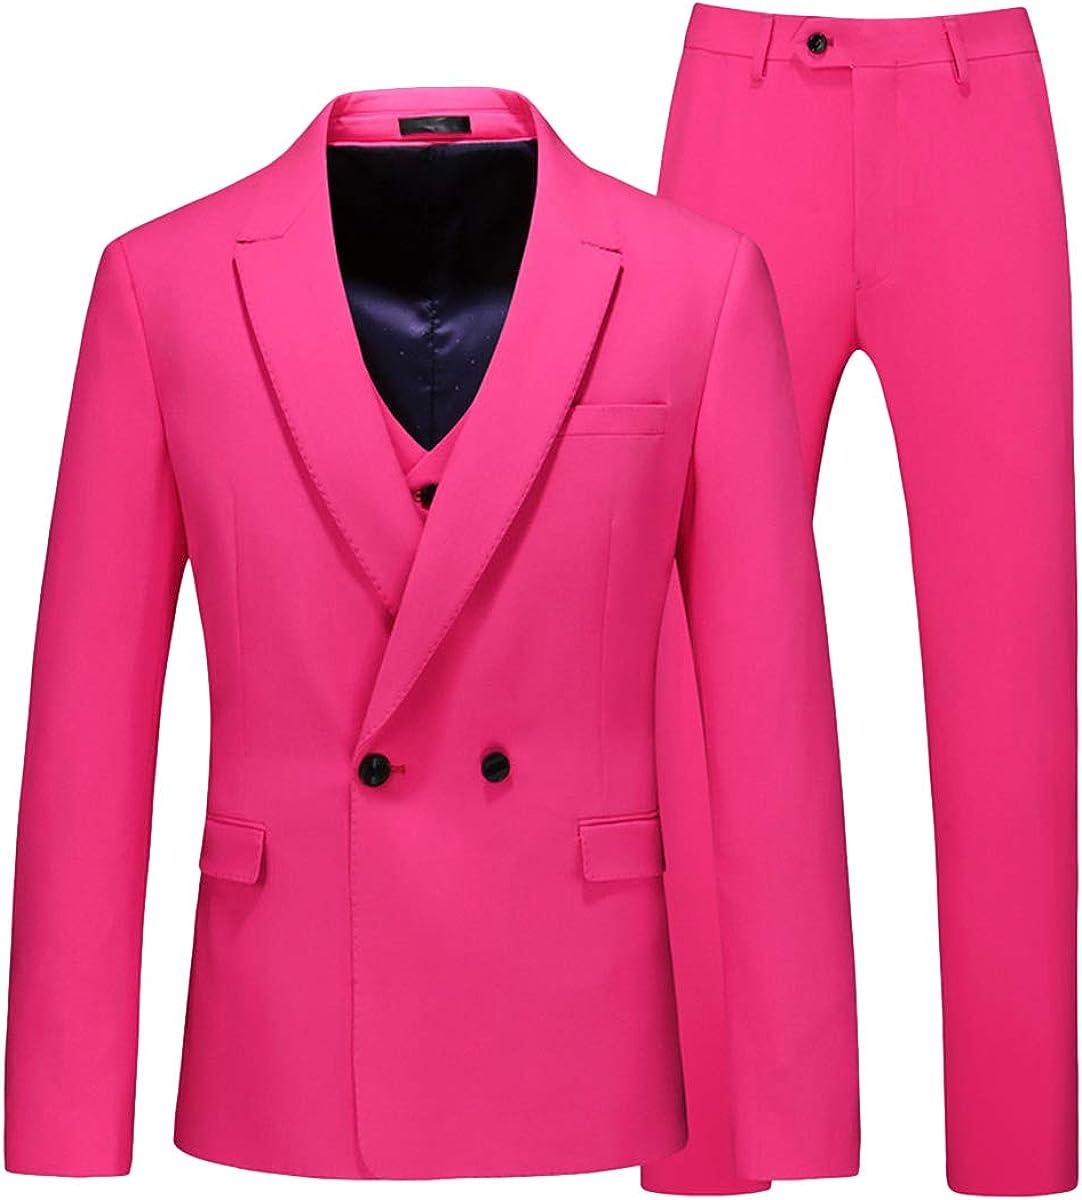 Wemaliyzd Men's 3 Piece Prom Suit Double Breasted Blazer Vest Pants